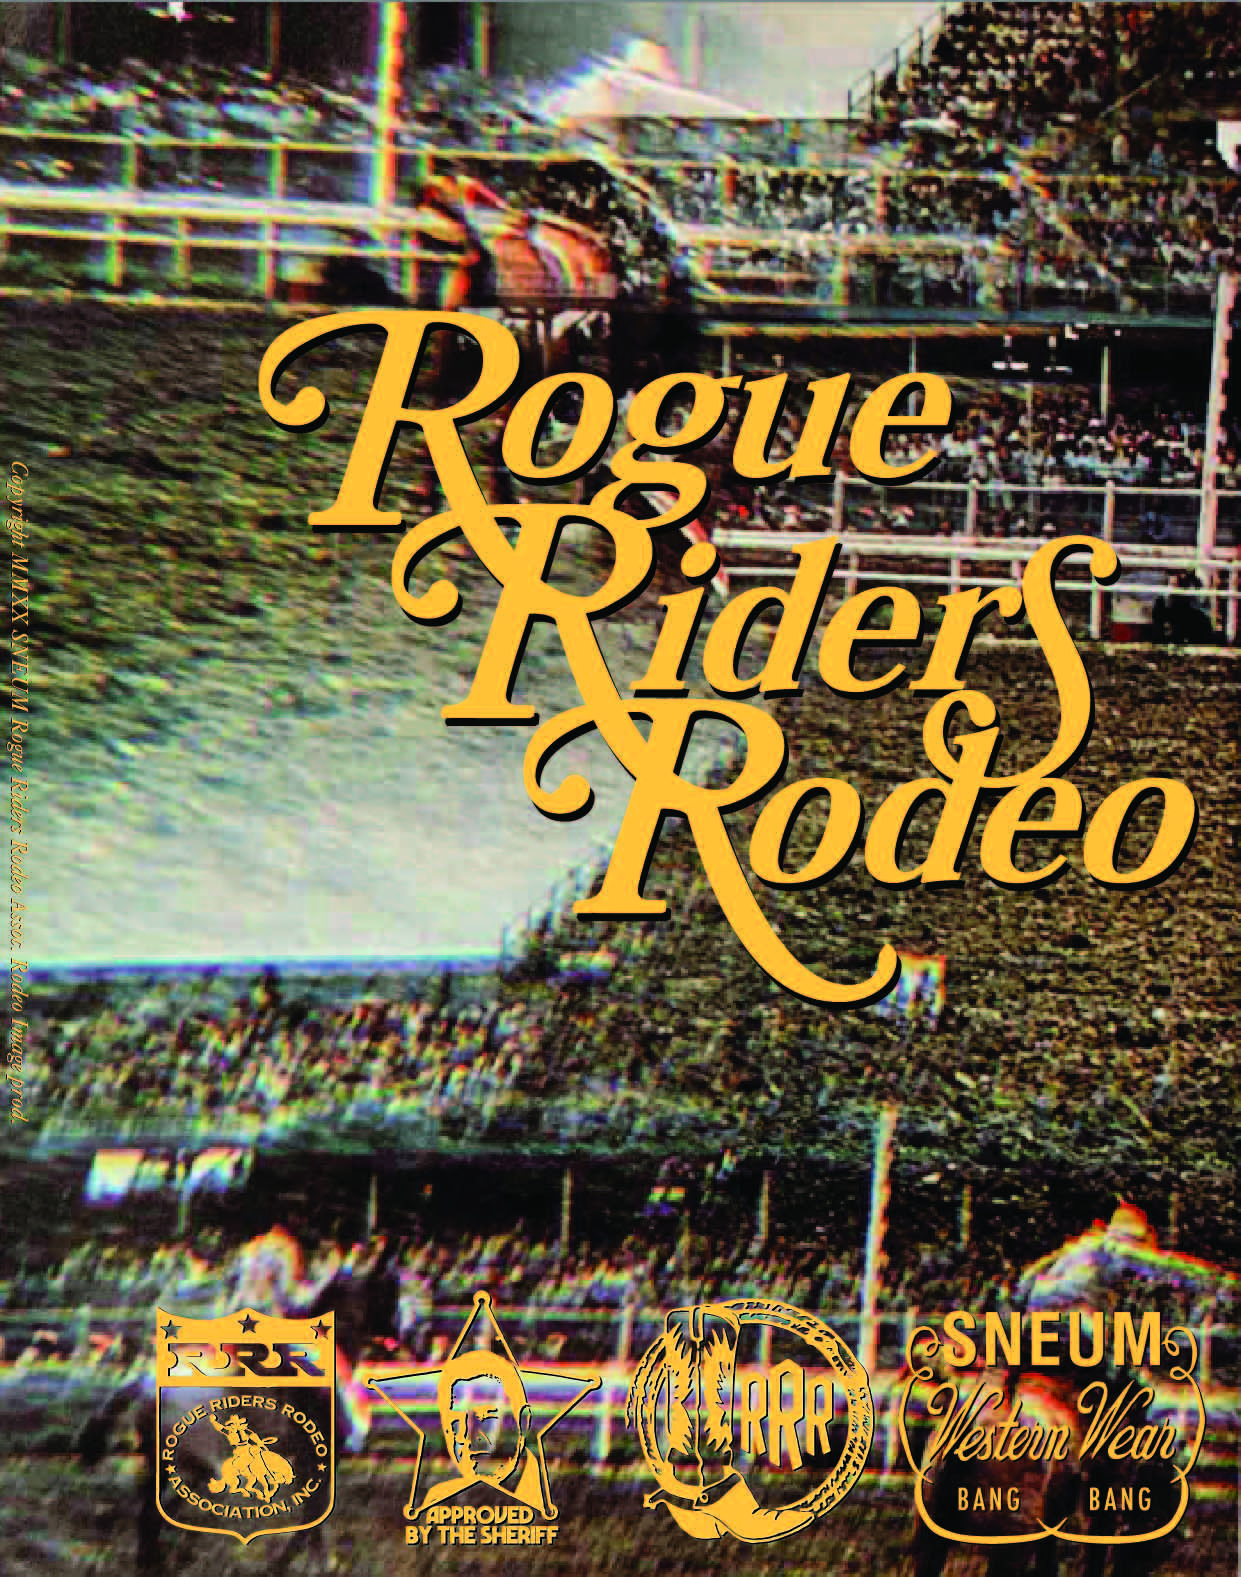 Rogue Riders Rodeo Western Wear Western Apparel